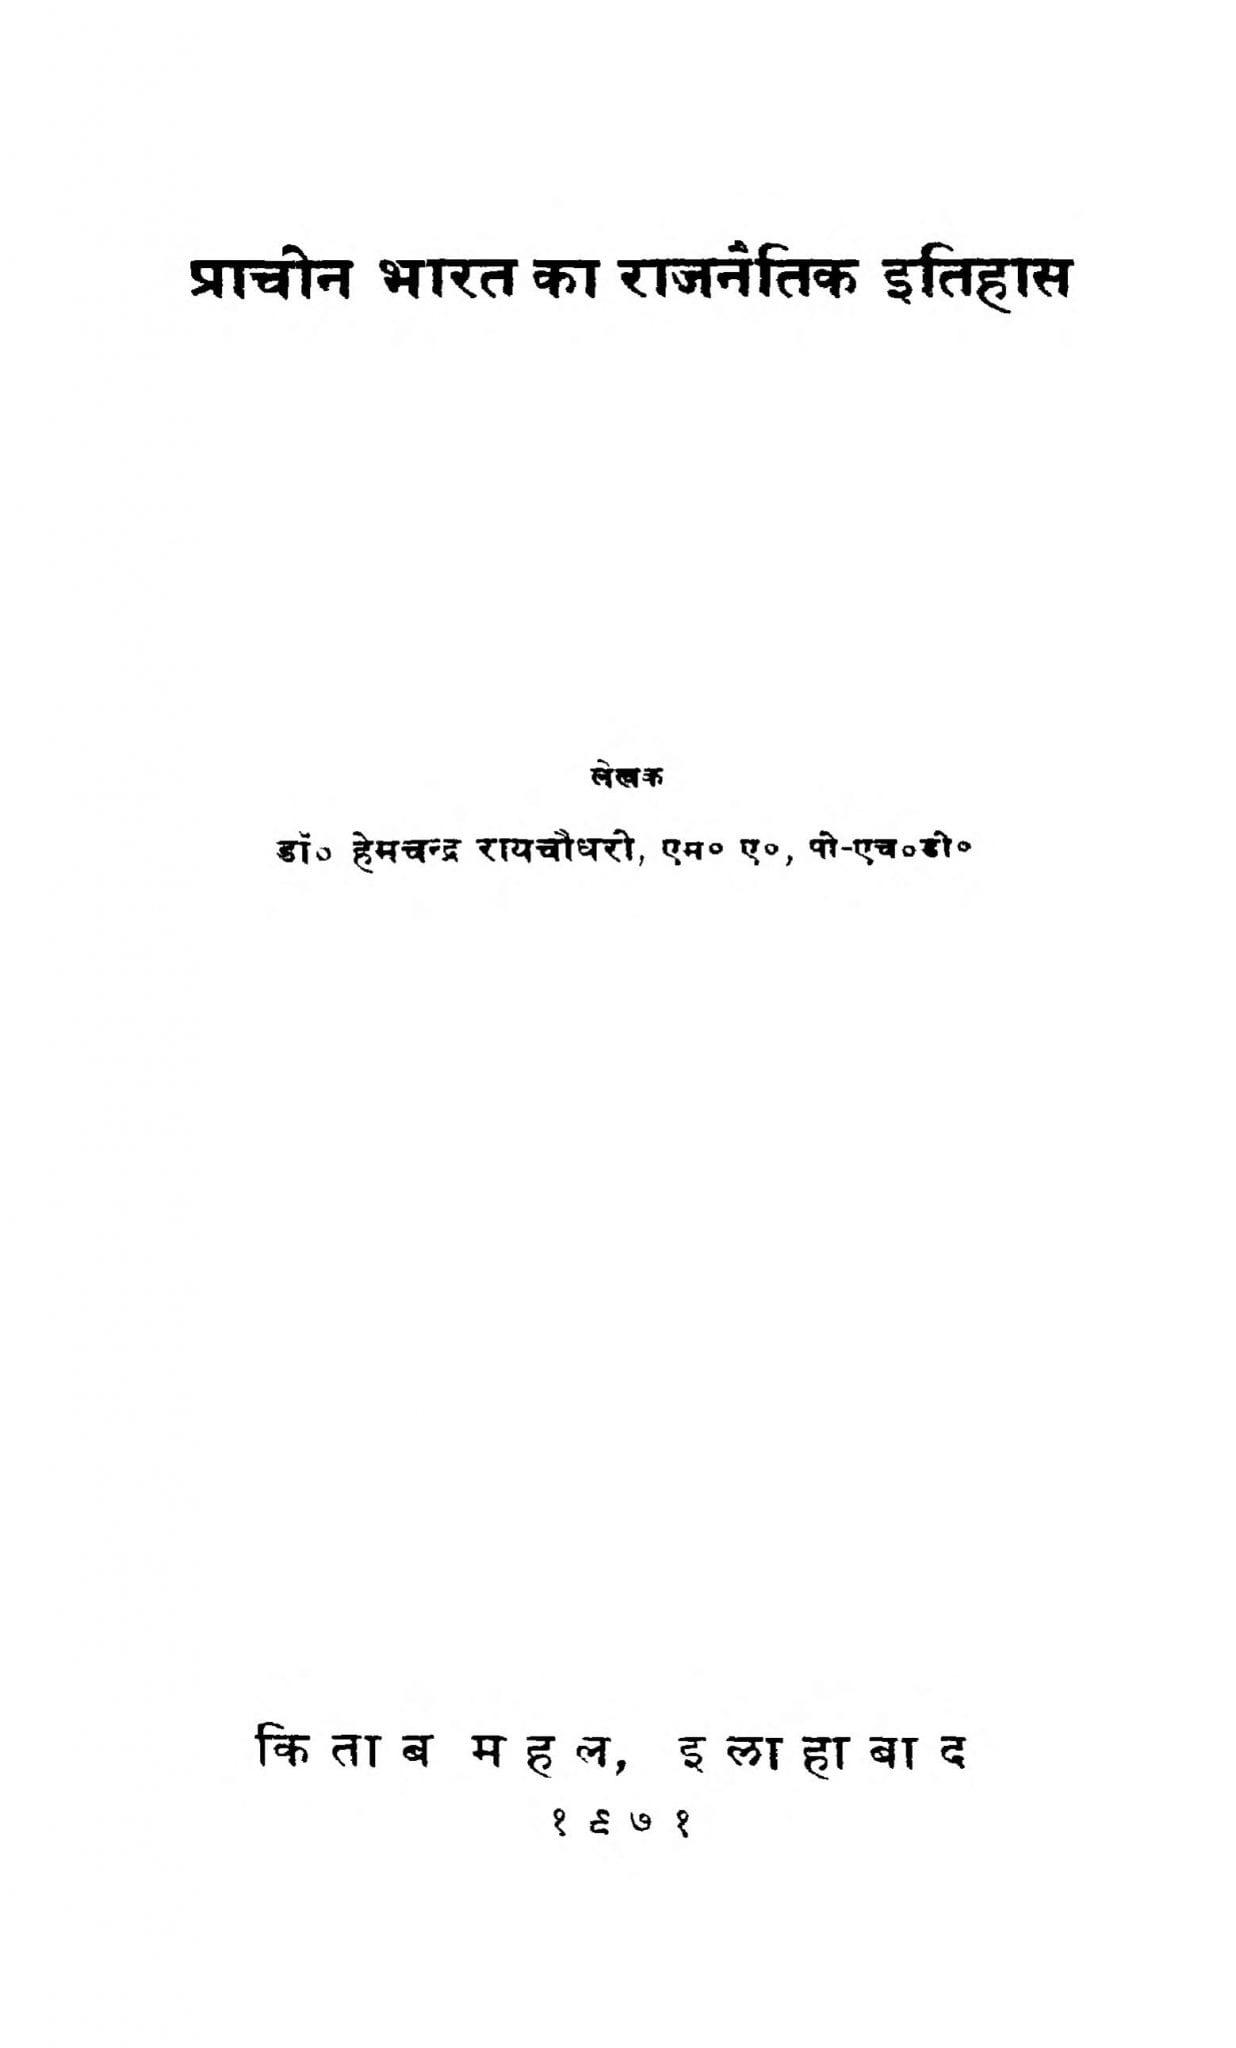 Book Image : प्राचीन भारत का राजनैतिक इतिहास - Prachin Bharat Ka Rajnatik Itihas